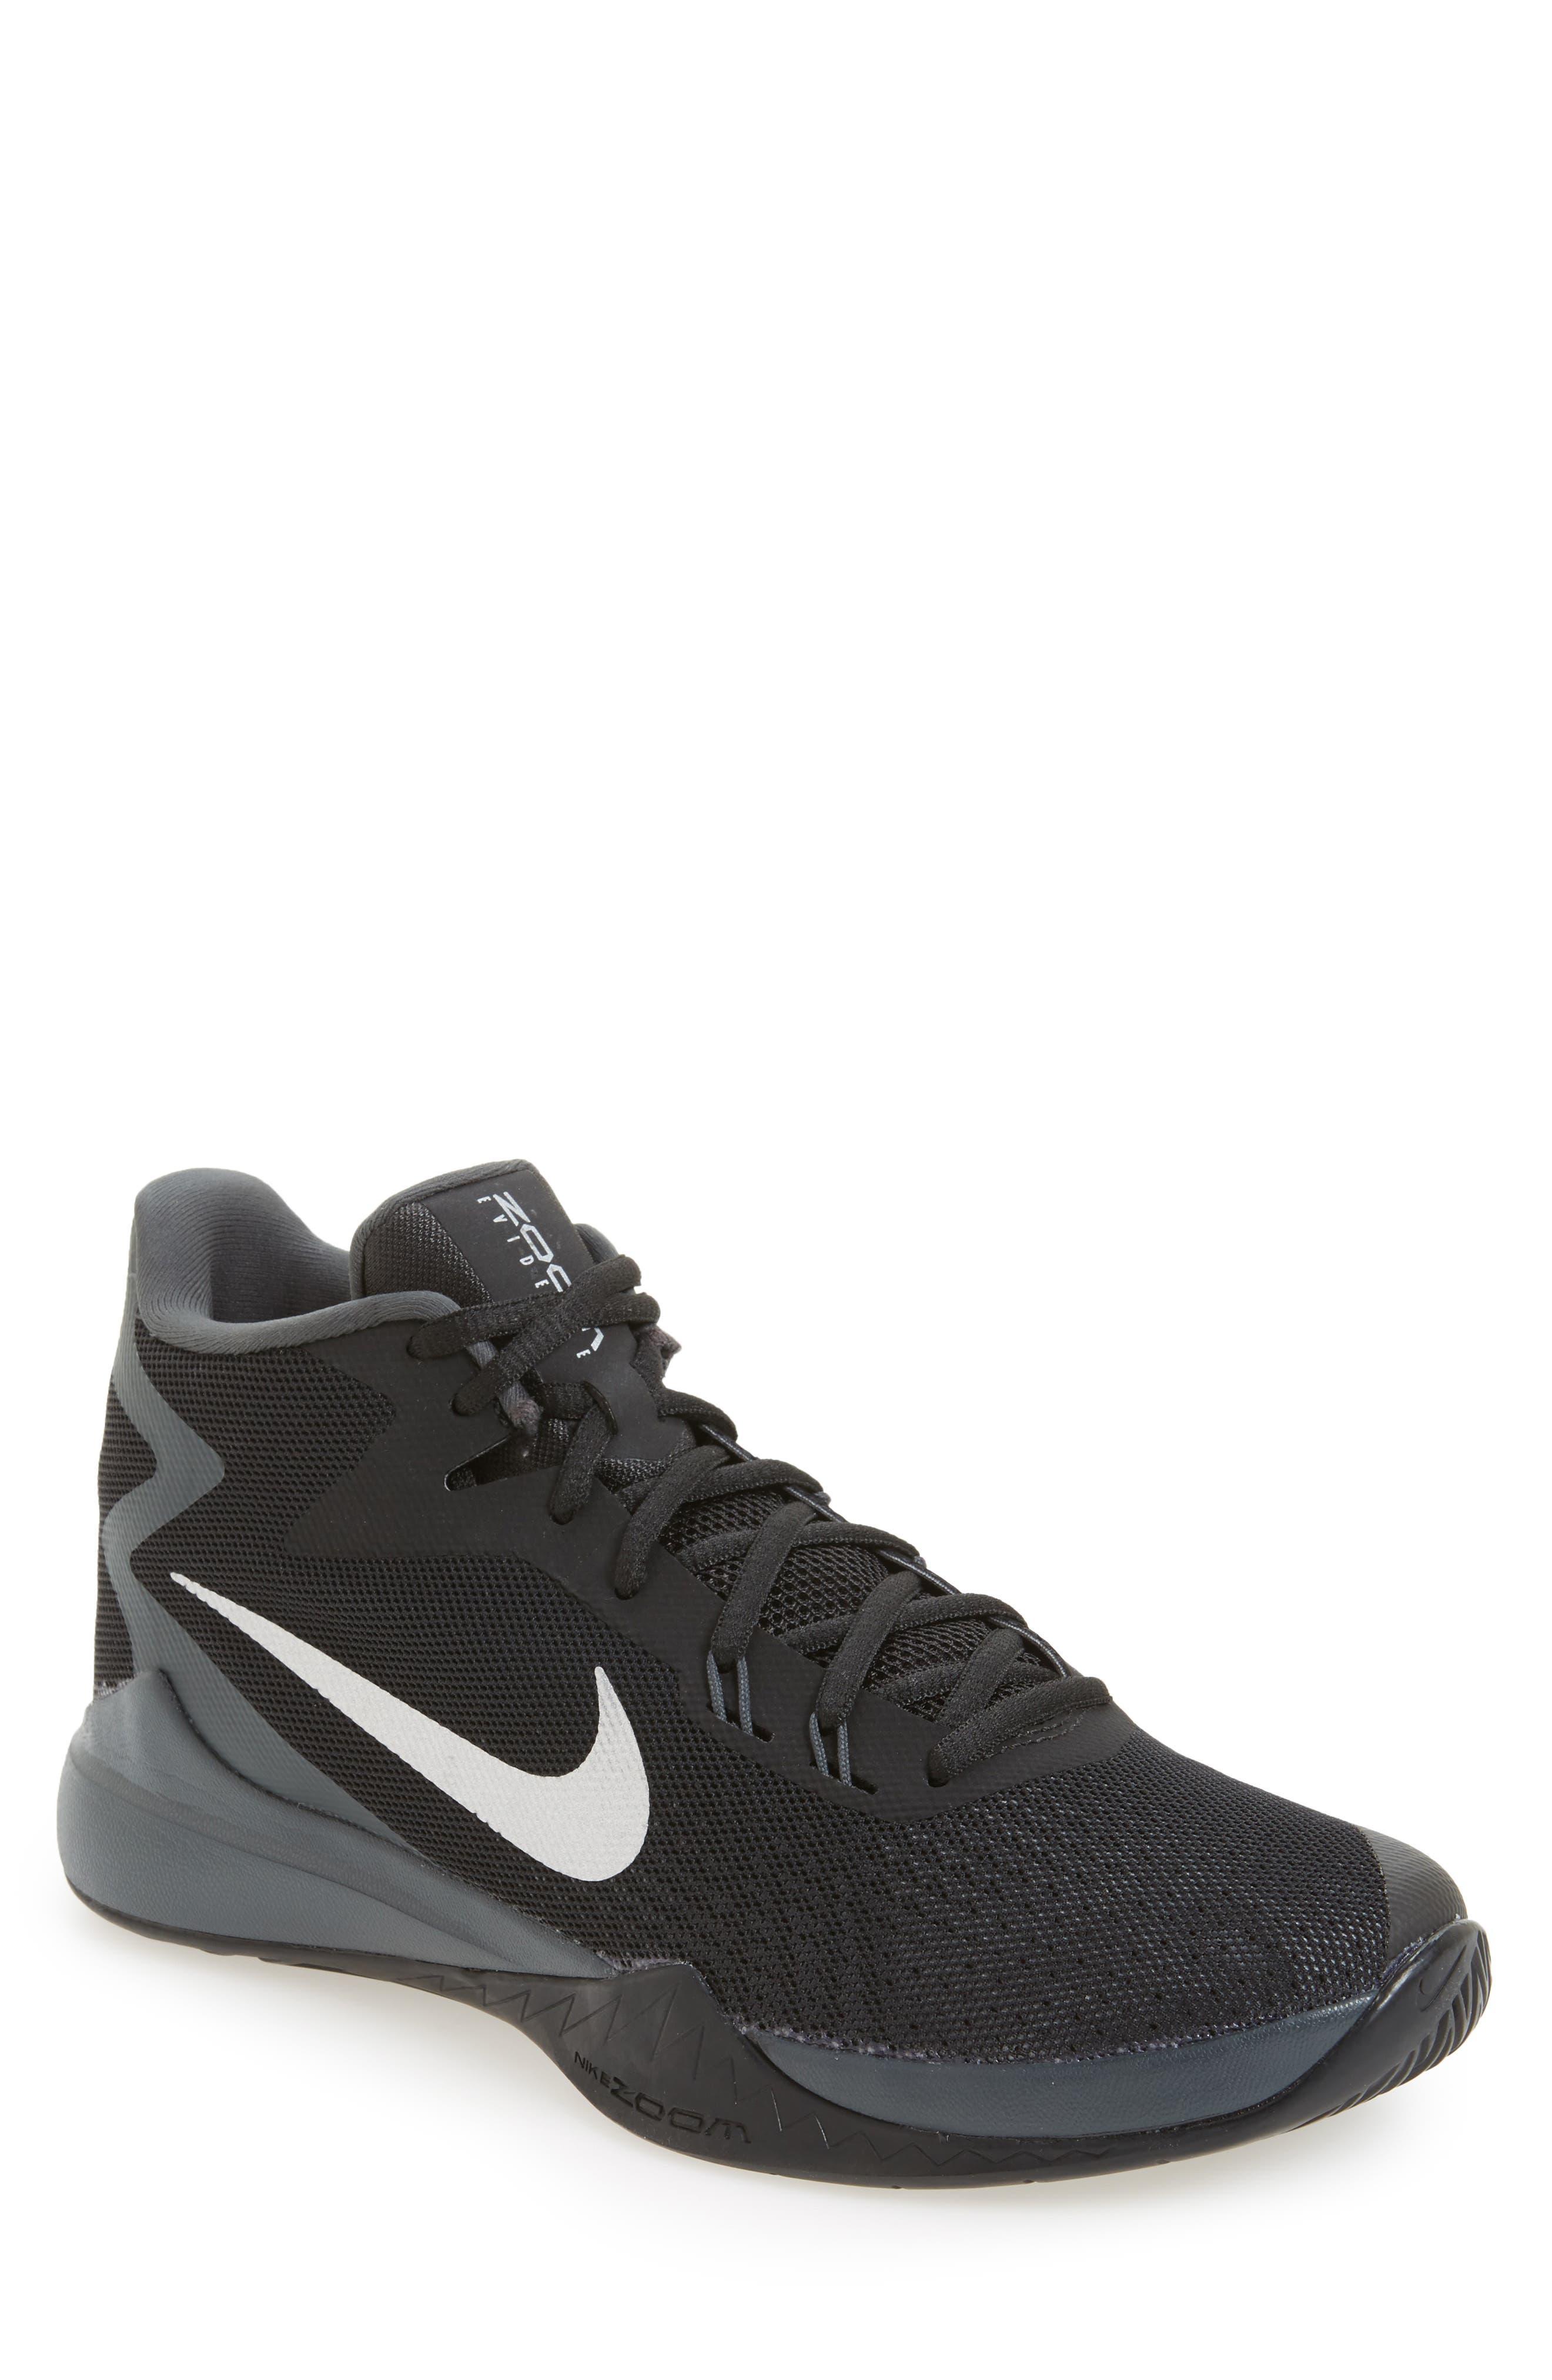 fa0dac9e7f72 Nike Air Force Max 2013 Men s Basketball